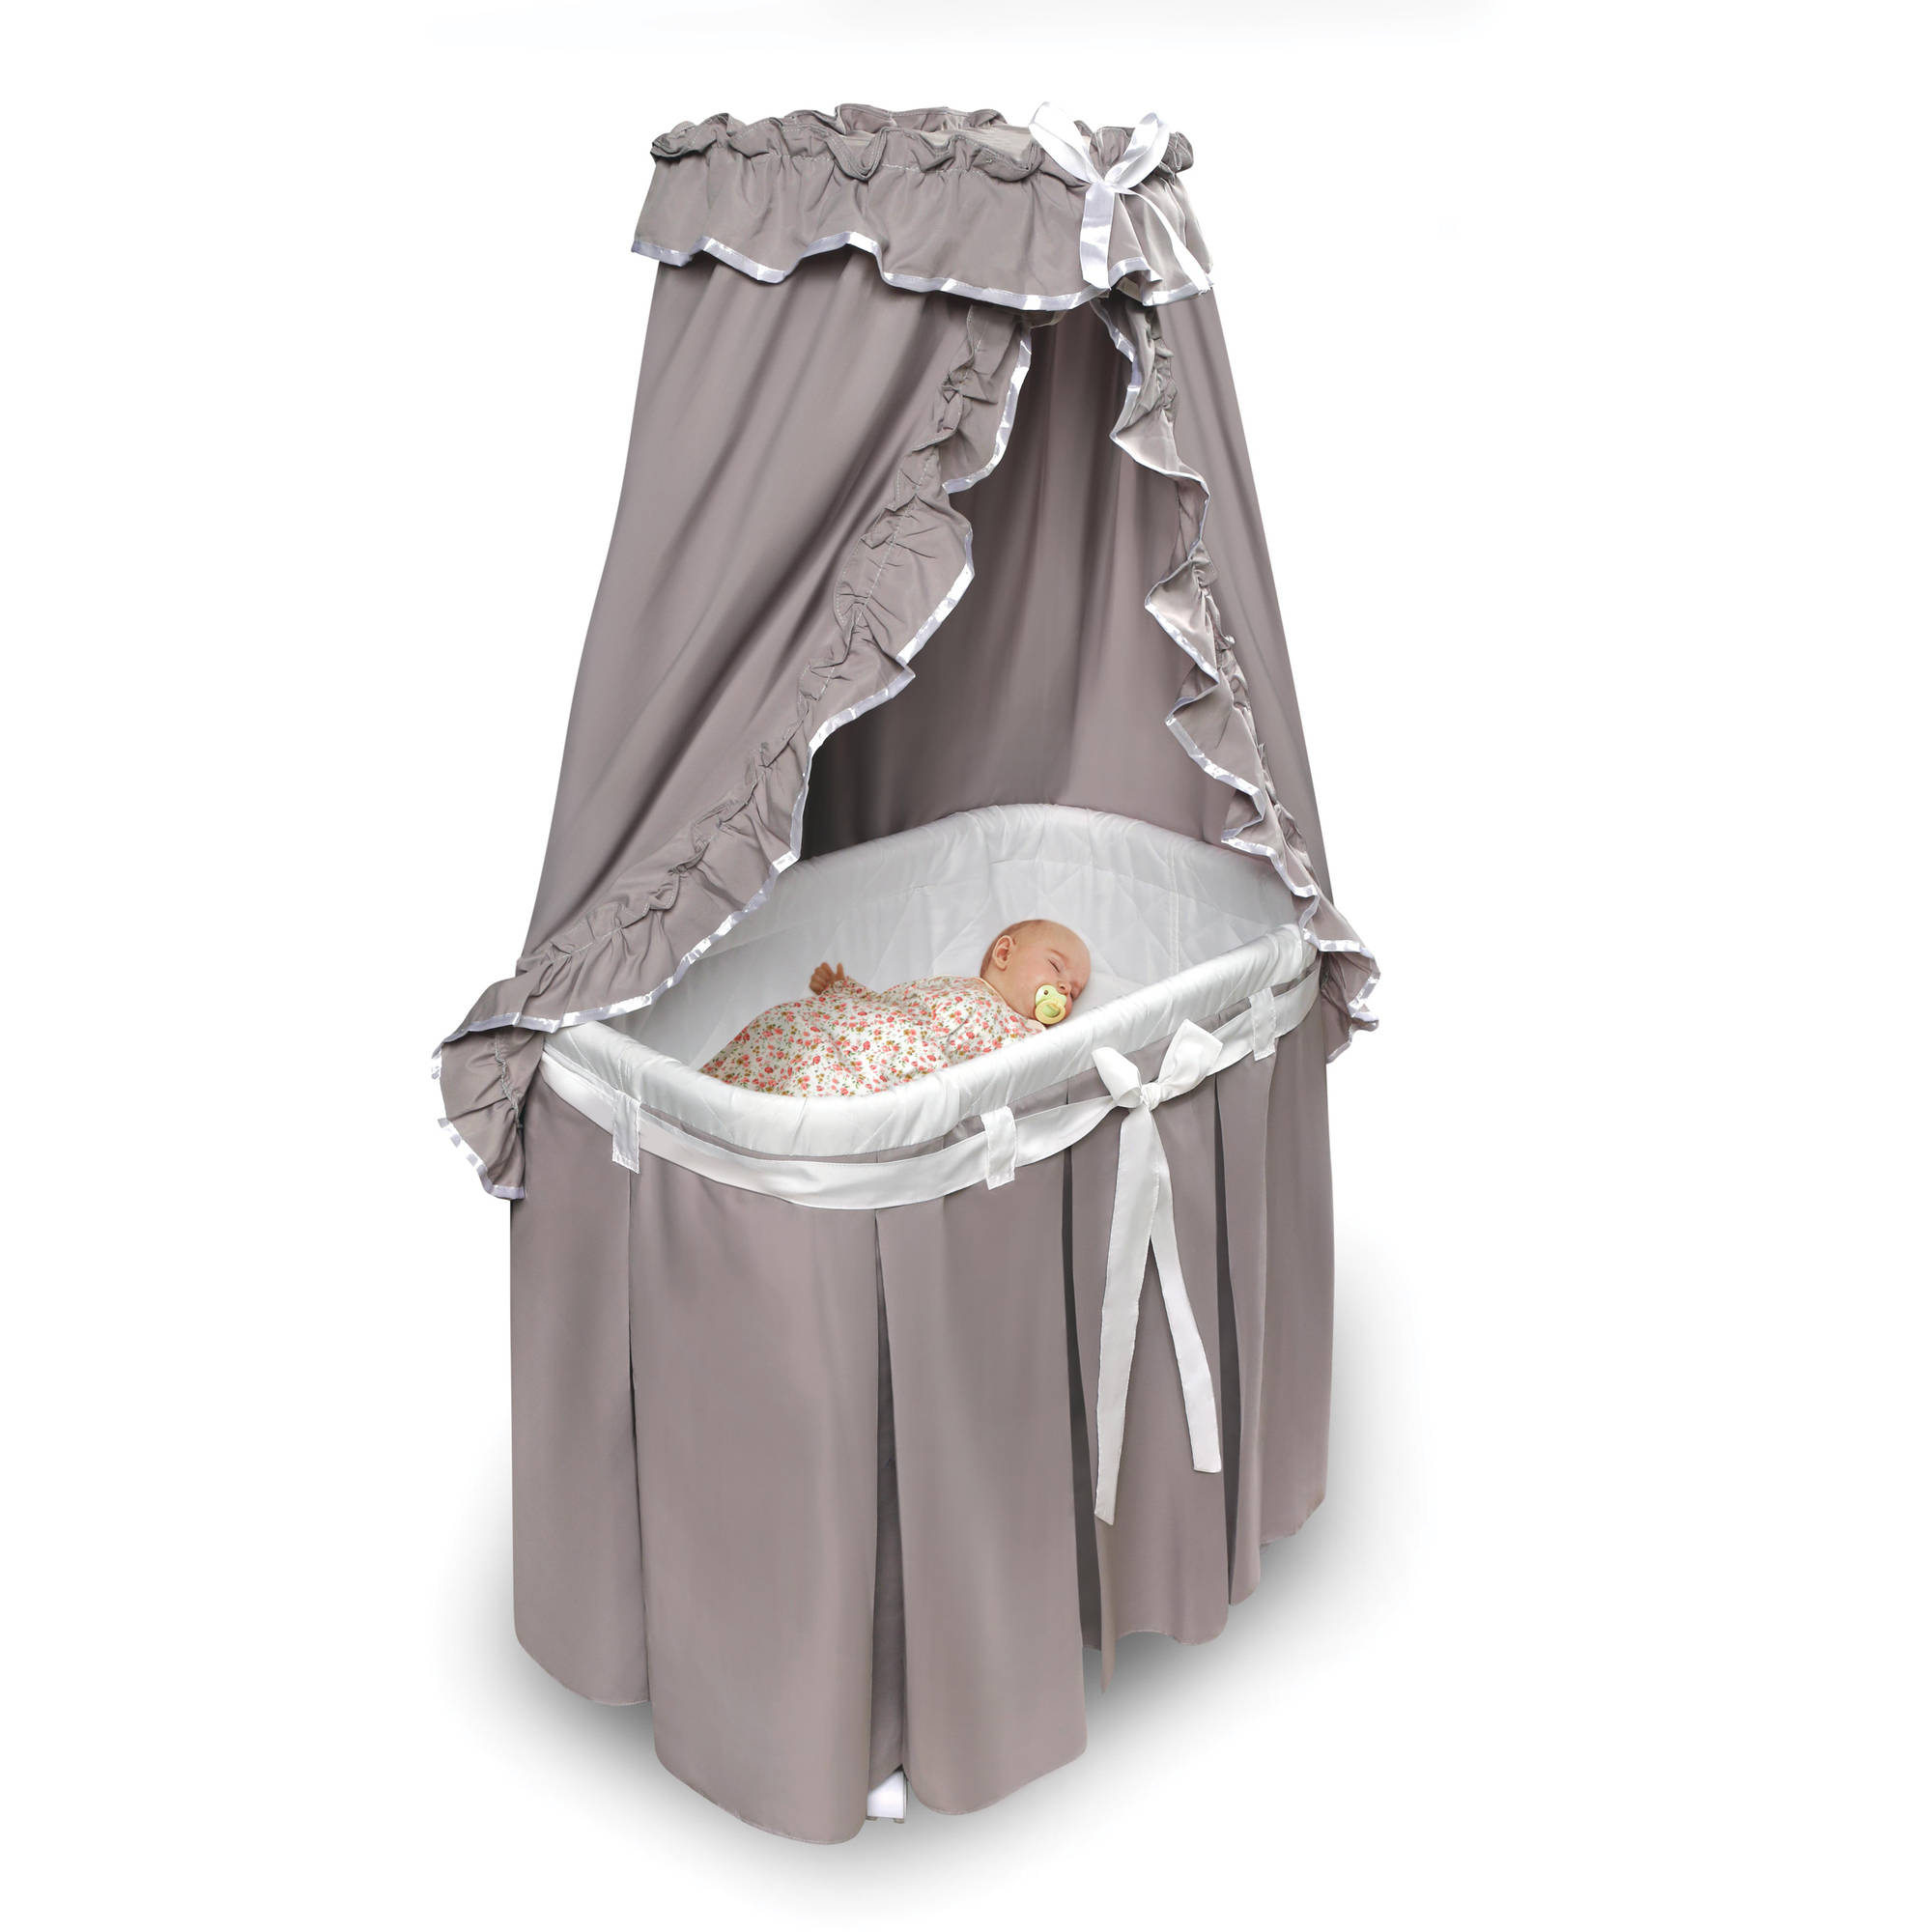 Baby Basket Bassinet Home Ideas